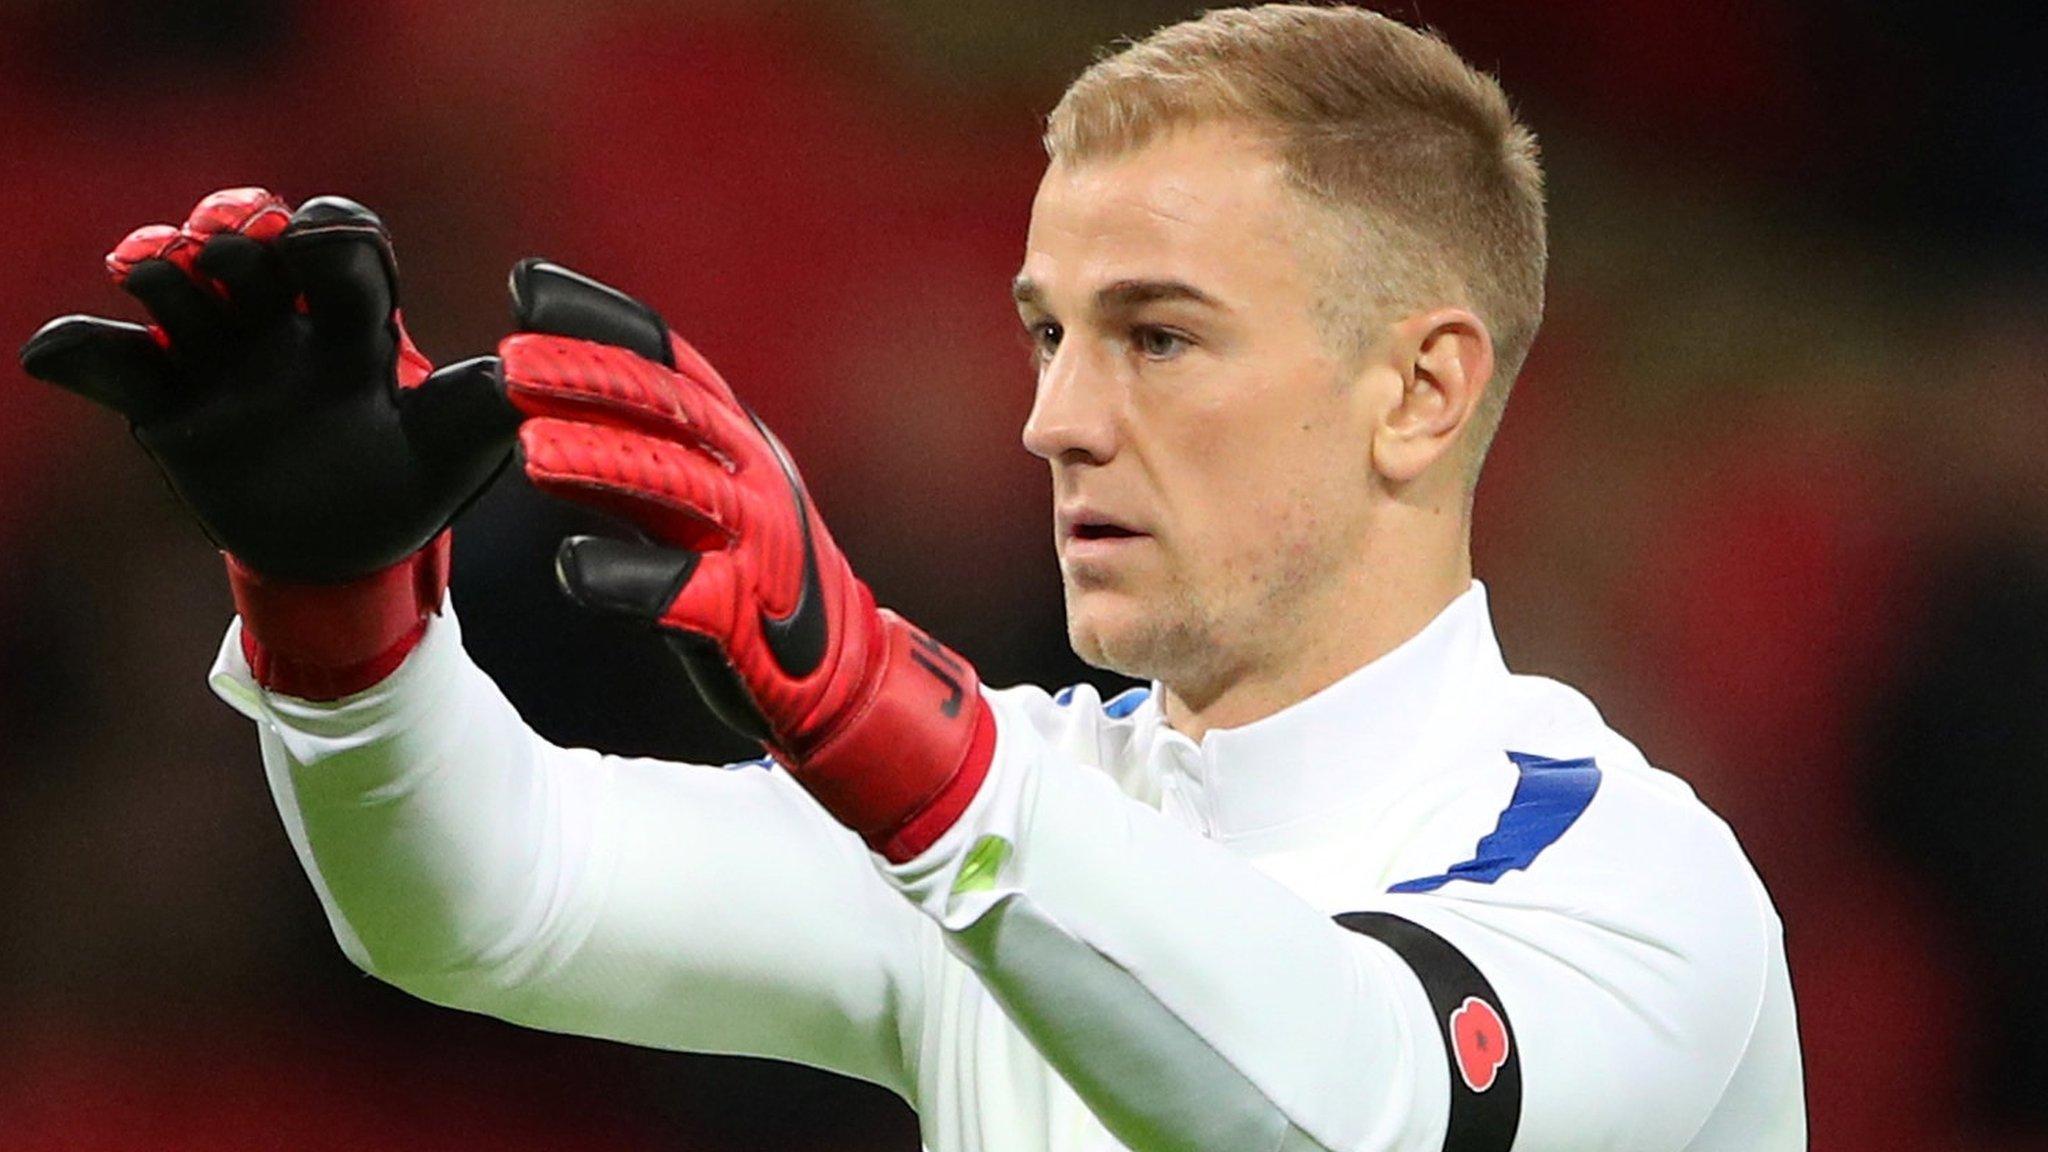 England should pick Butland ahead of 'terrible' Hart - Banks